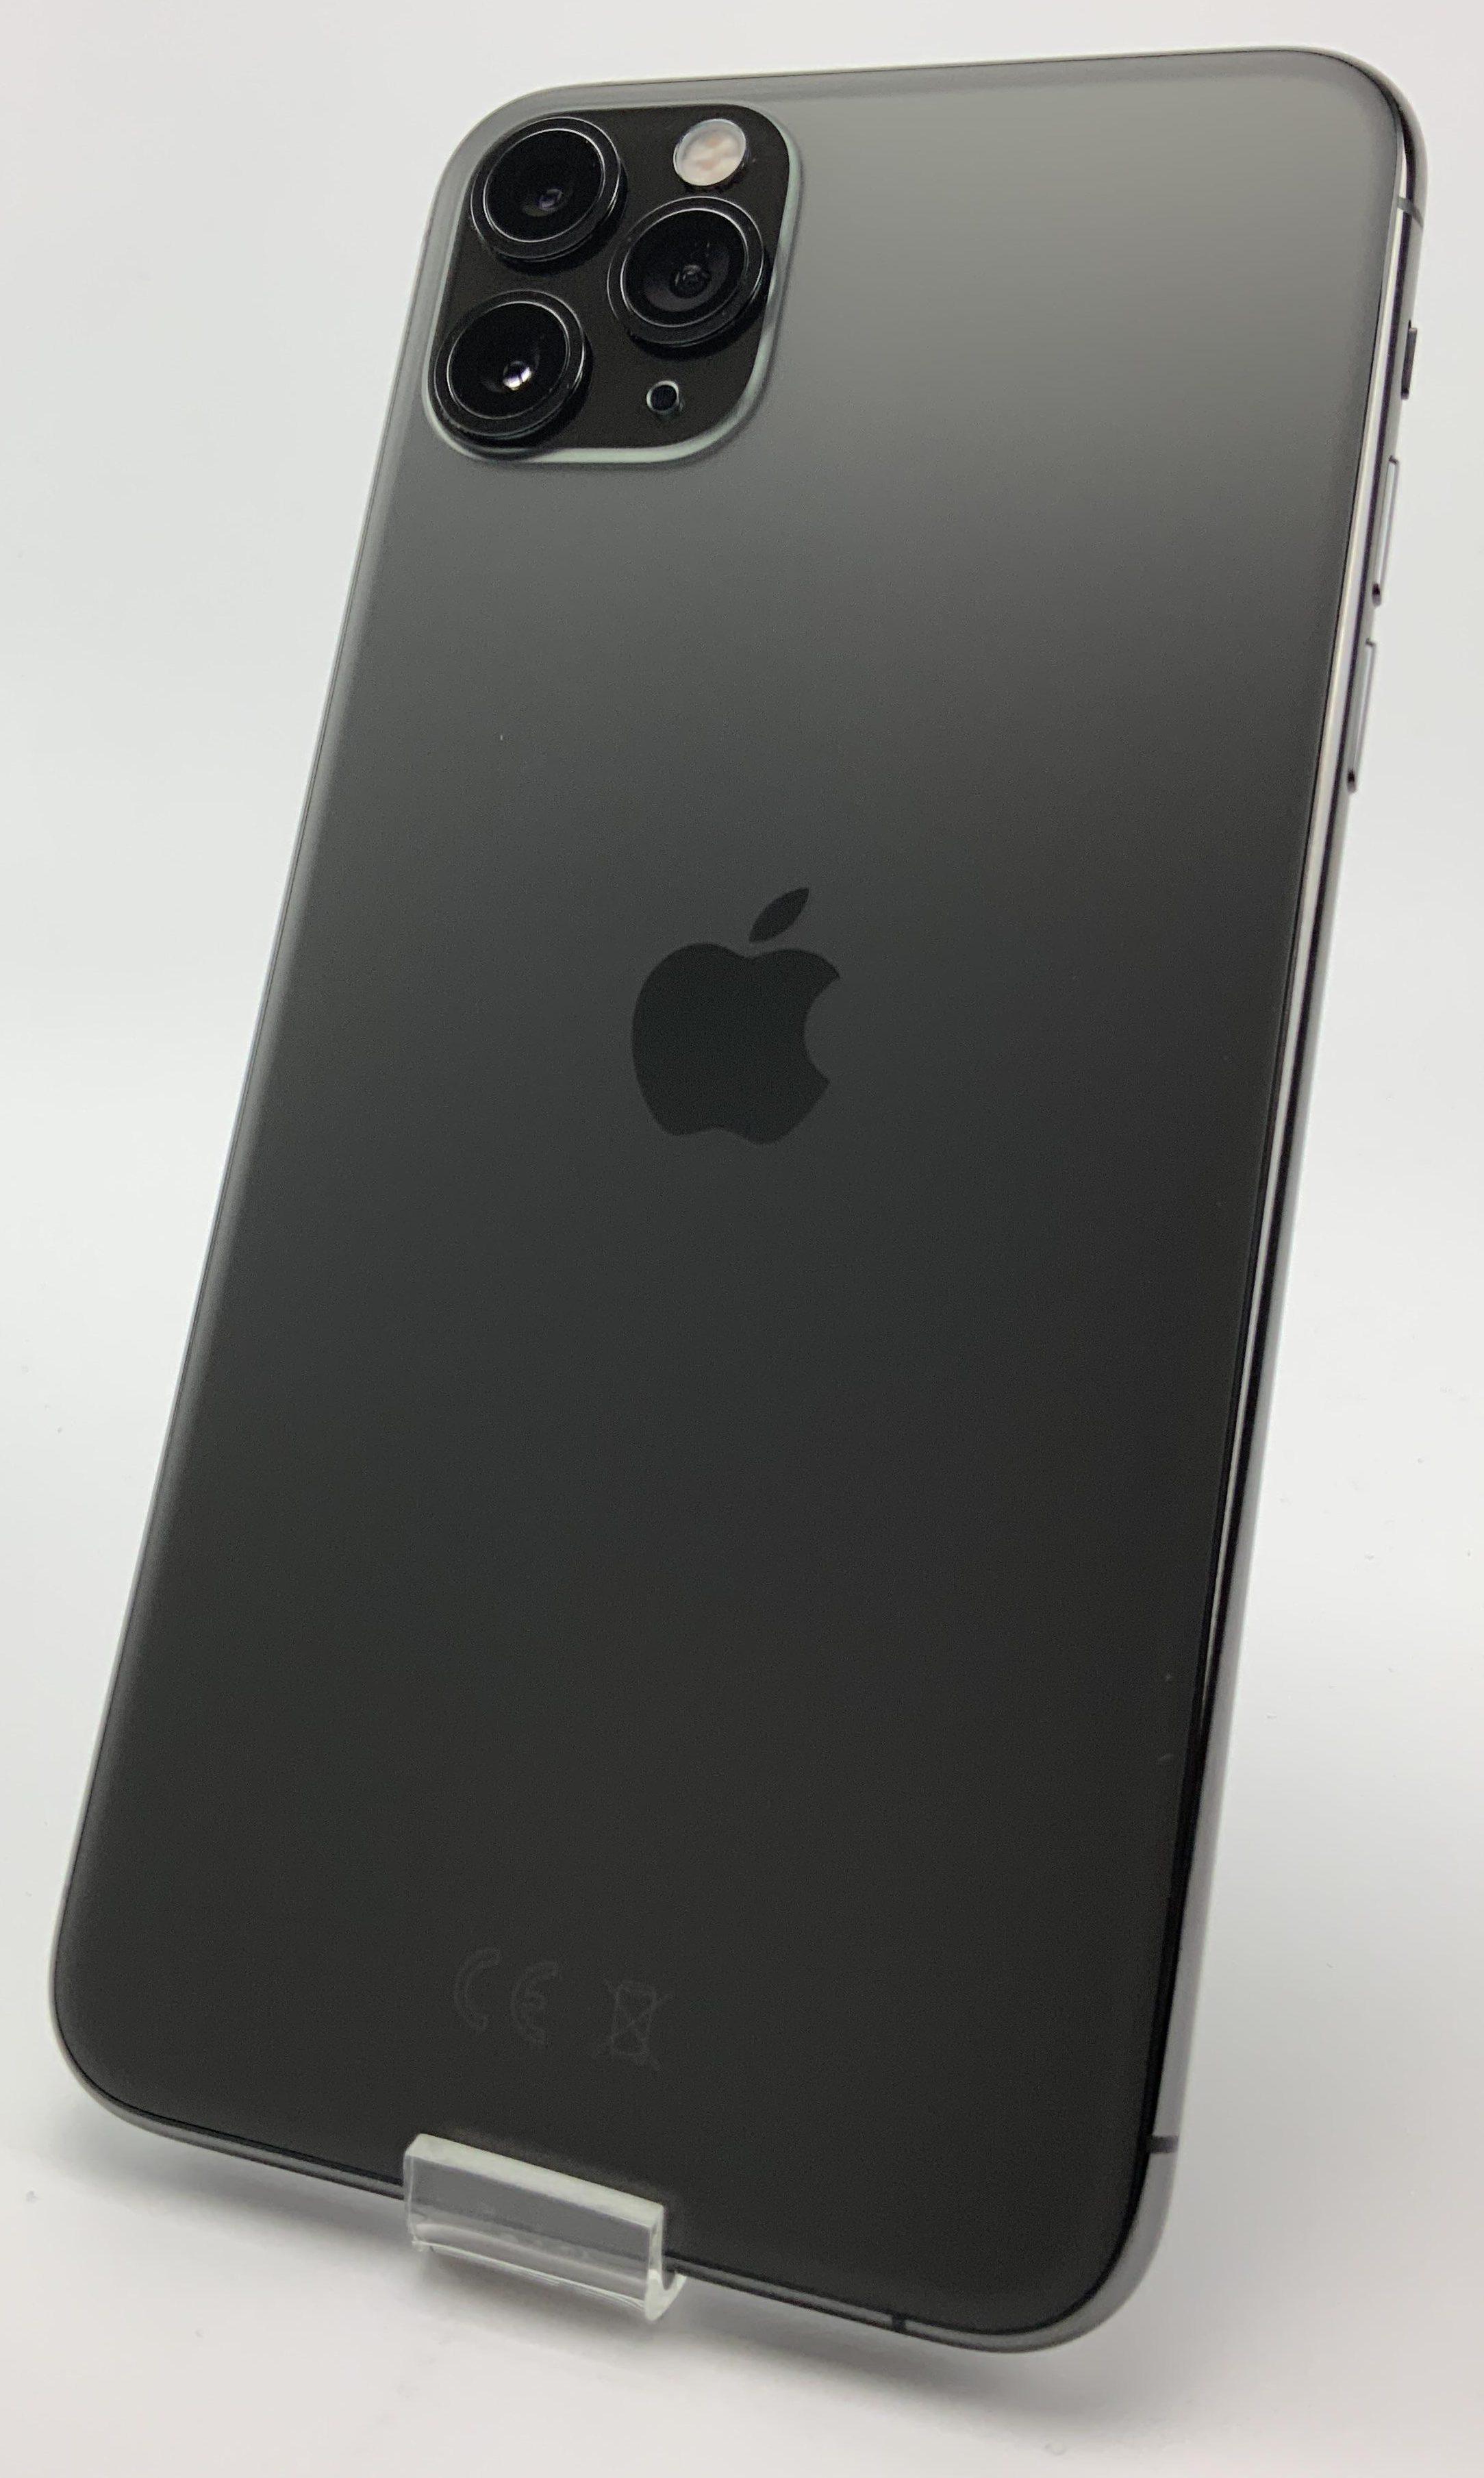 iPhone 11 Pro Max 256GB, 256GB, Space Gray, imagen 2